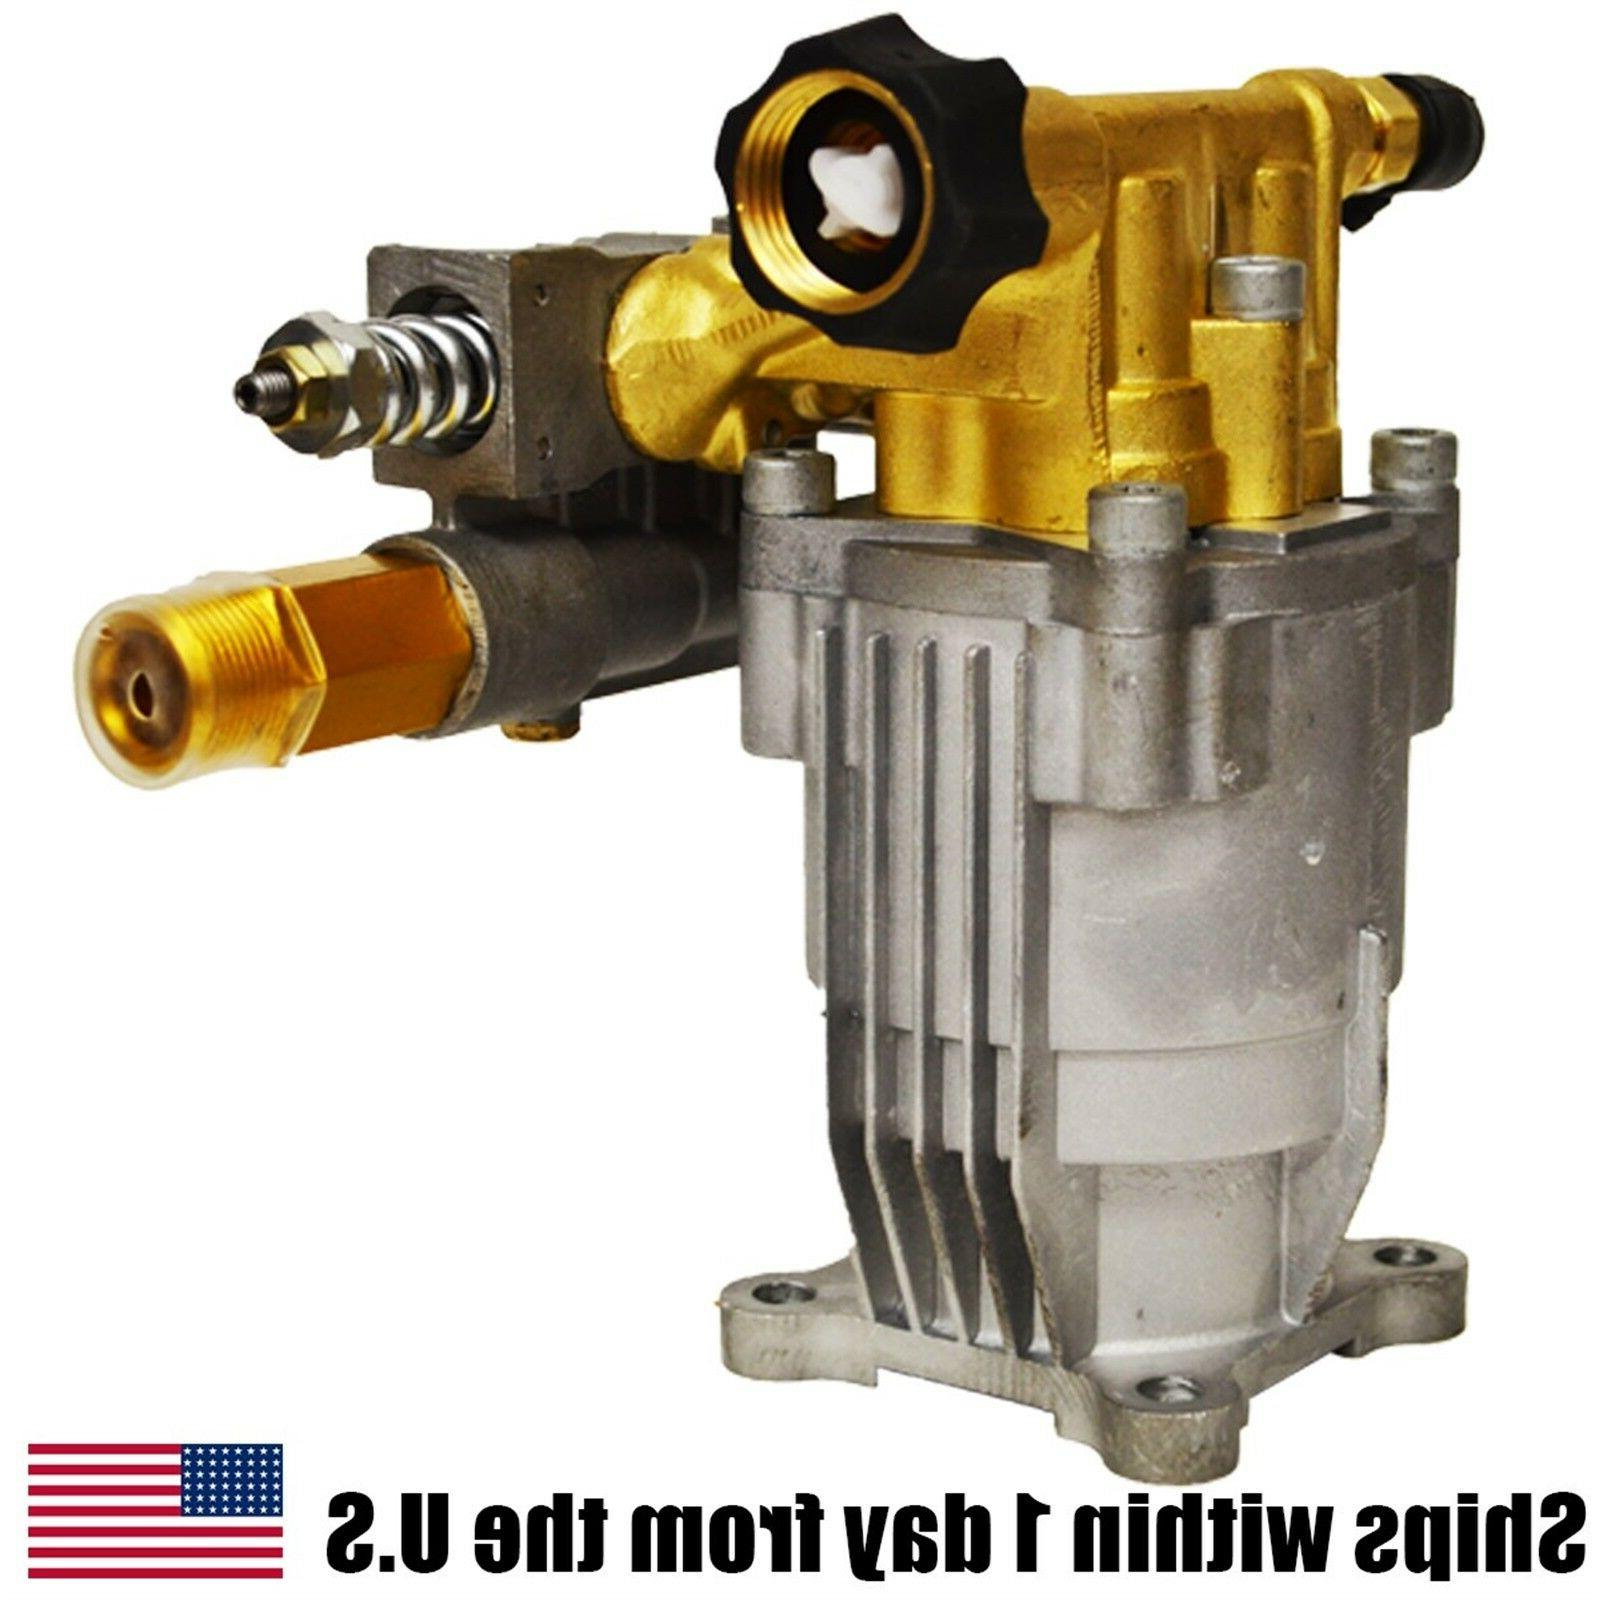 OEM Himore 309515003 Power Pressure Washer Water Pump 3000 P